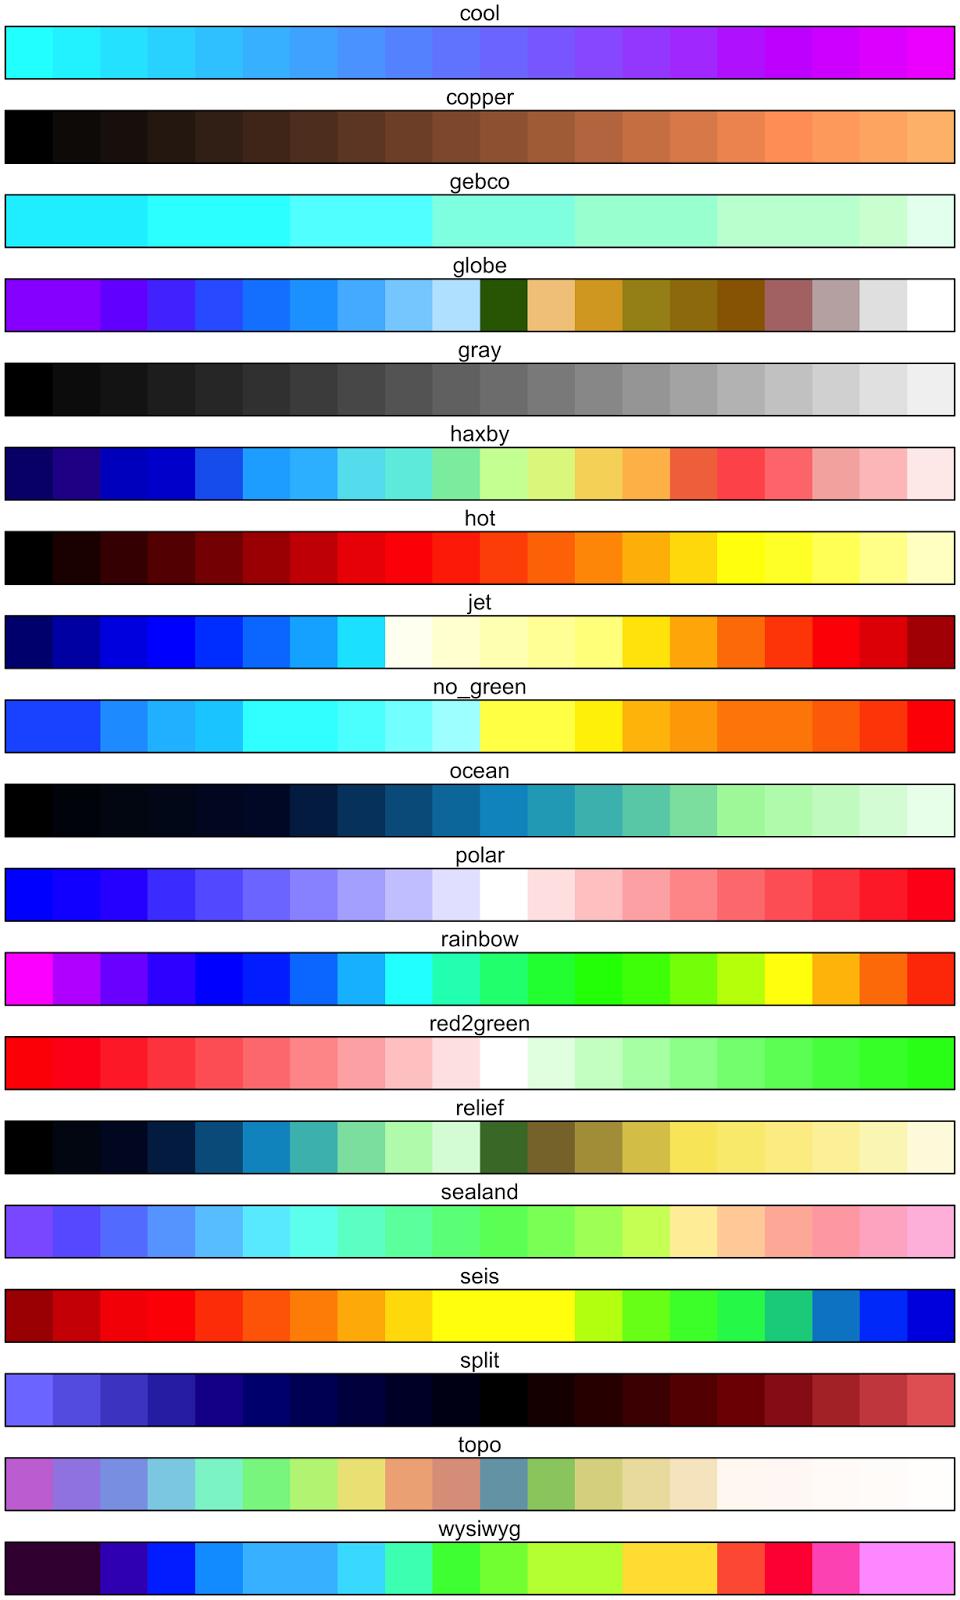 GMT standard color palettes | R-bloggers